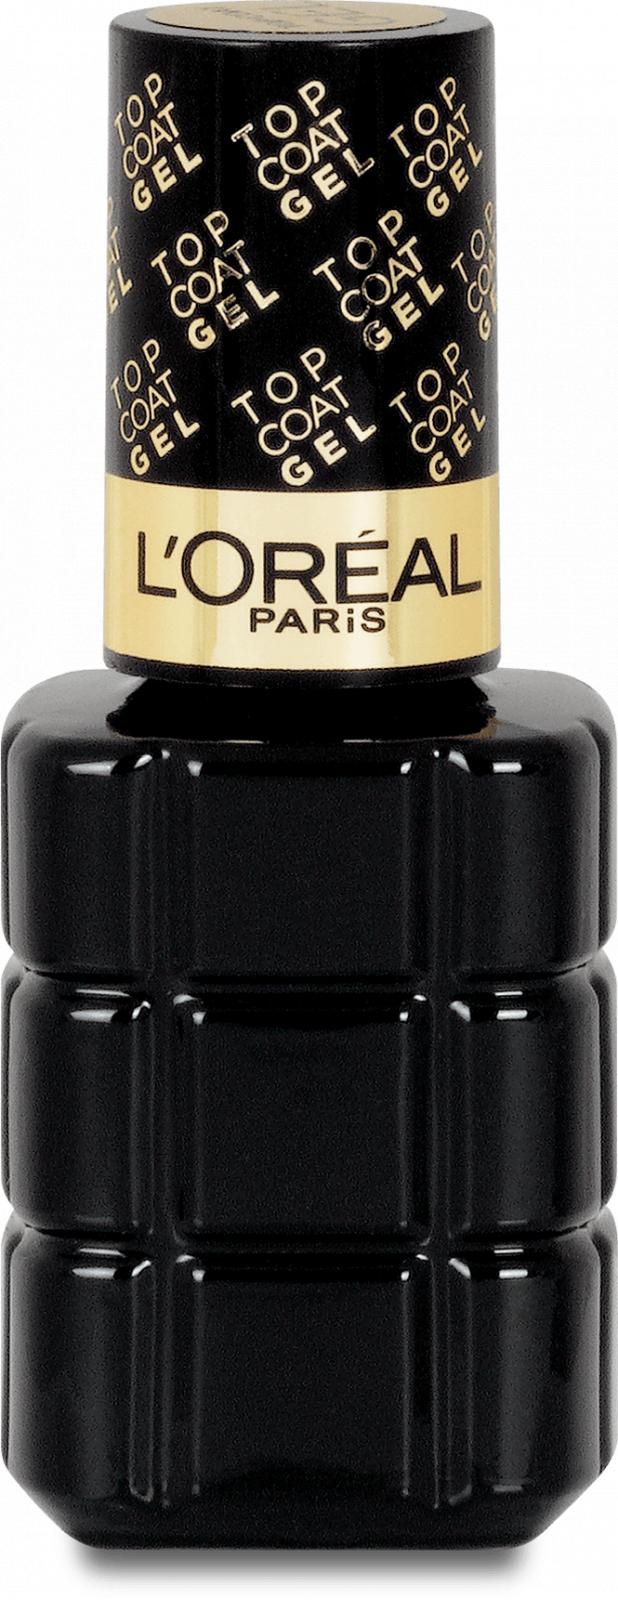 L Oreal Paris Top Coat Gel 13 5 Ml Zbozi Cz